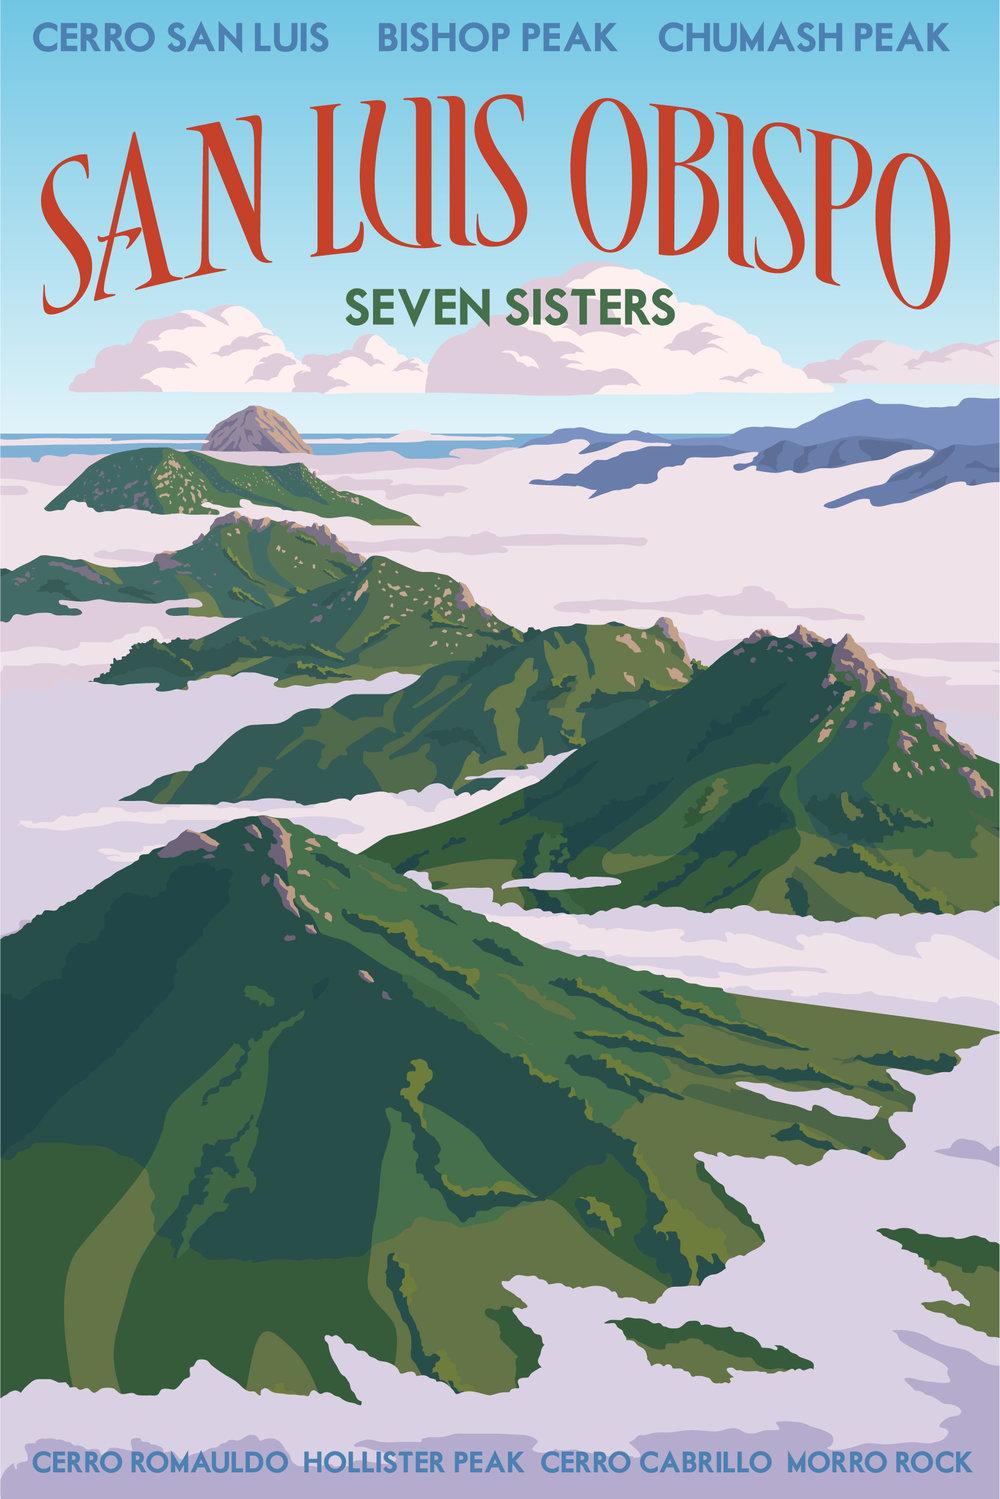 San Luis Obispo Seven Sisters.jpg